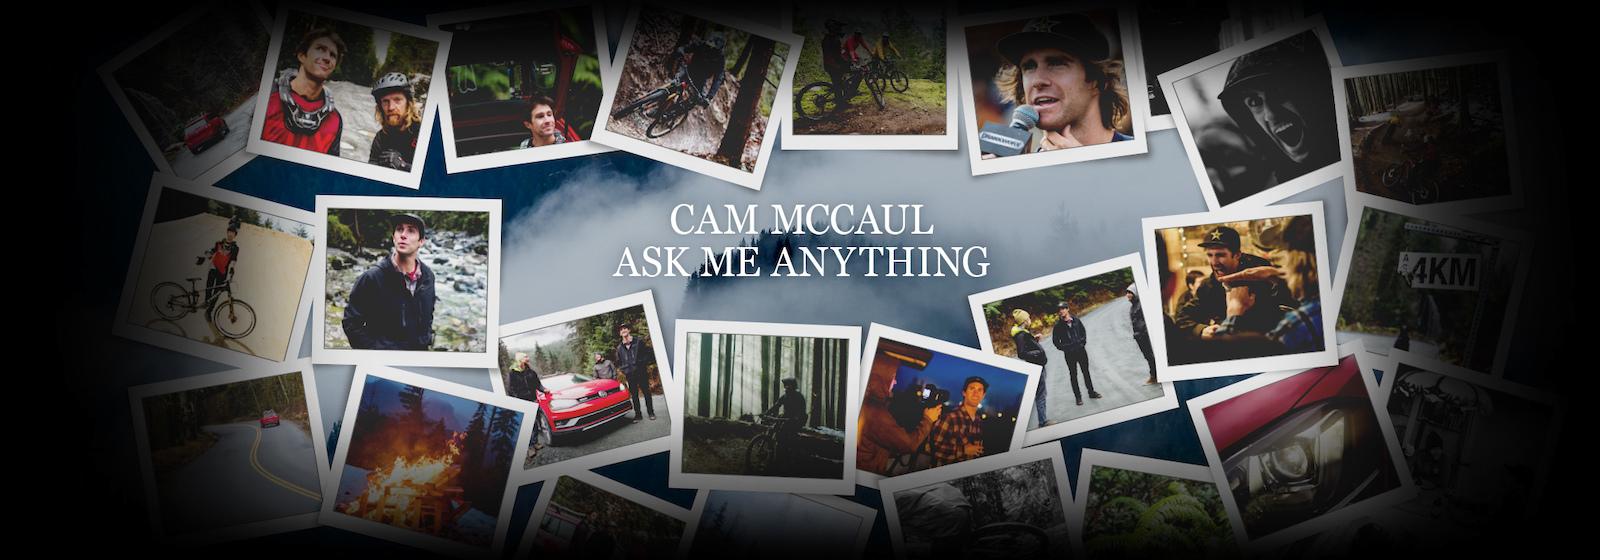 Cam McCaul Ask Me Anything